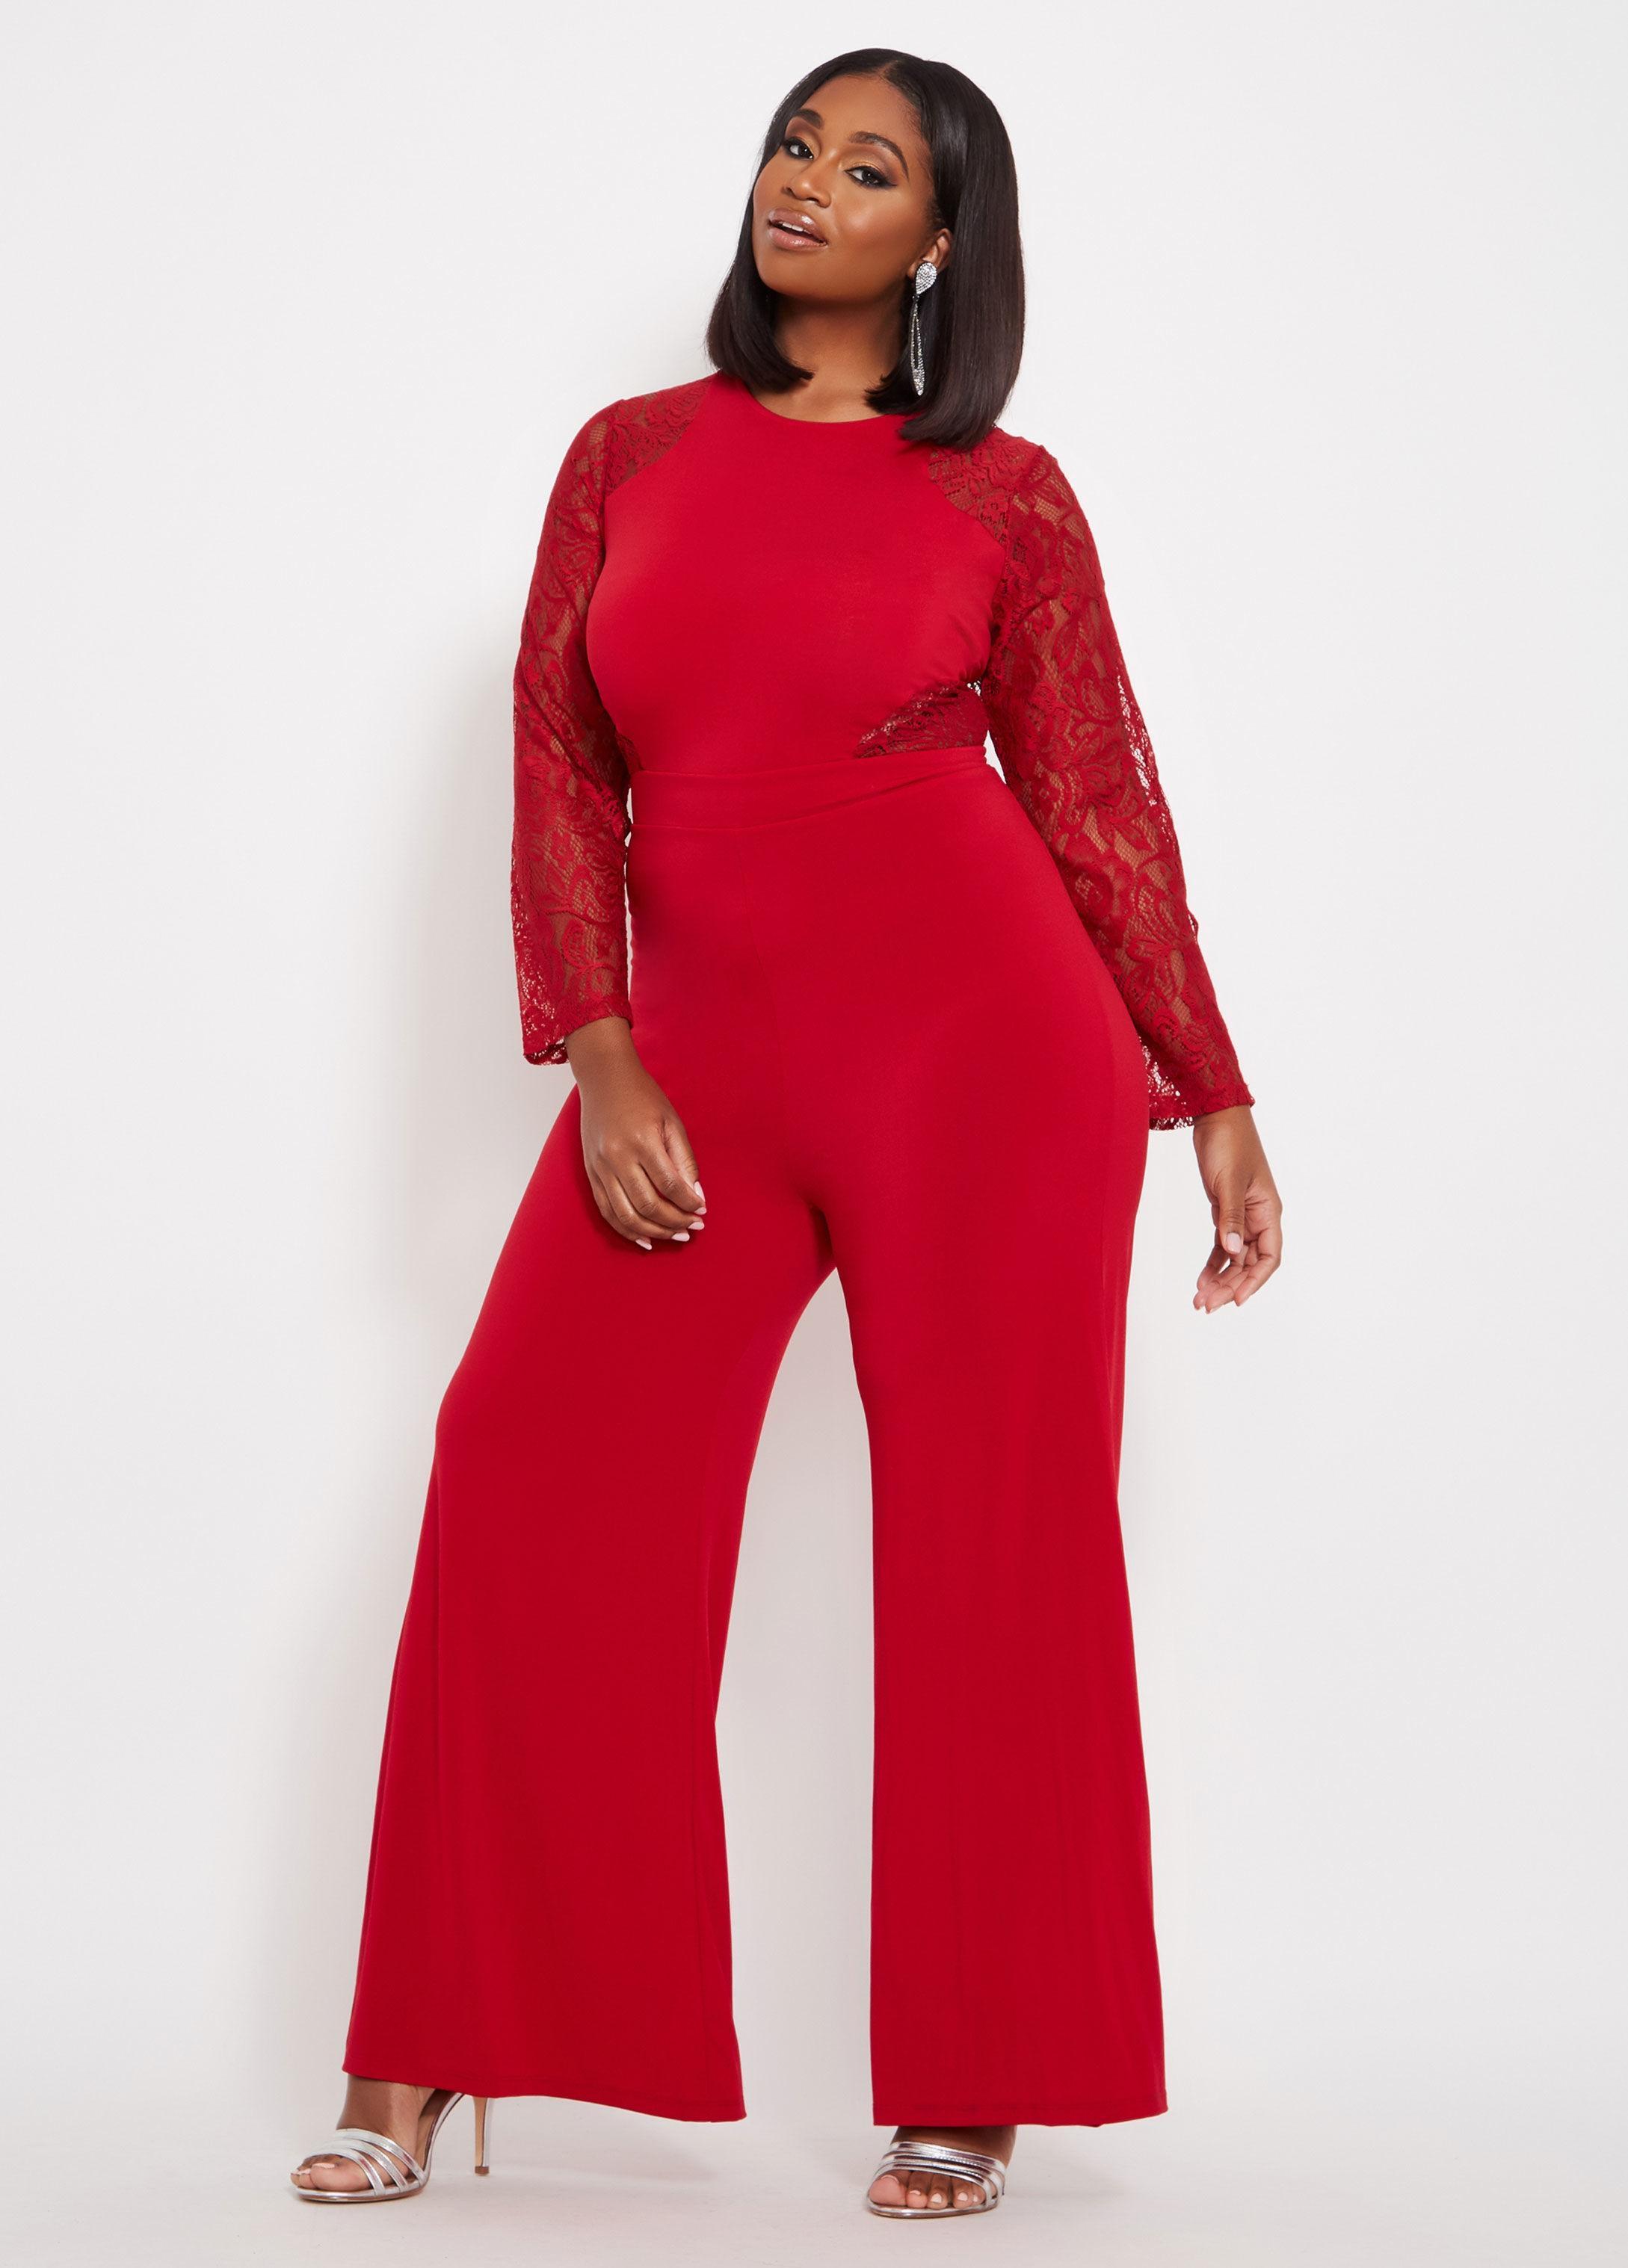 4372de6c3989 Lyst - Ashley Stewart Plus Size Tall Lace Long Sleeve Jumpsuit in Red